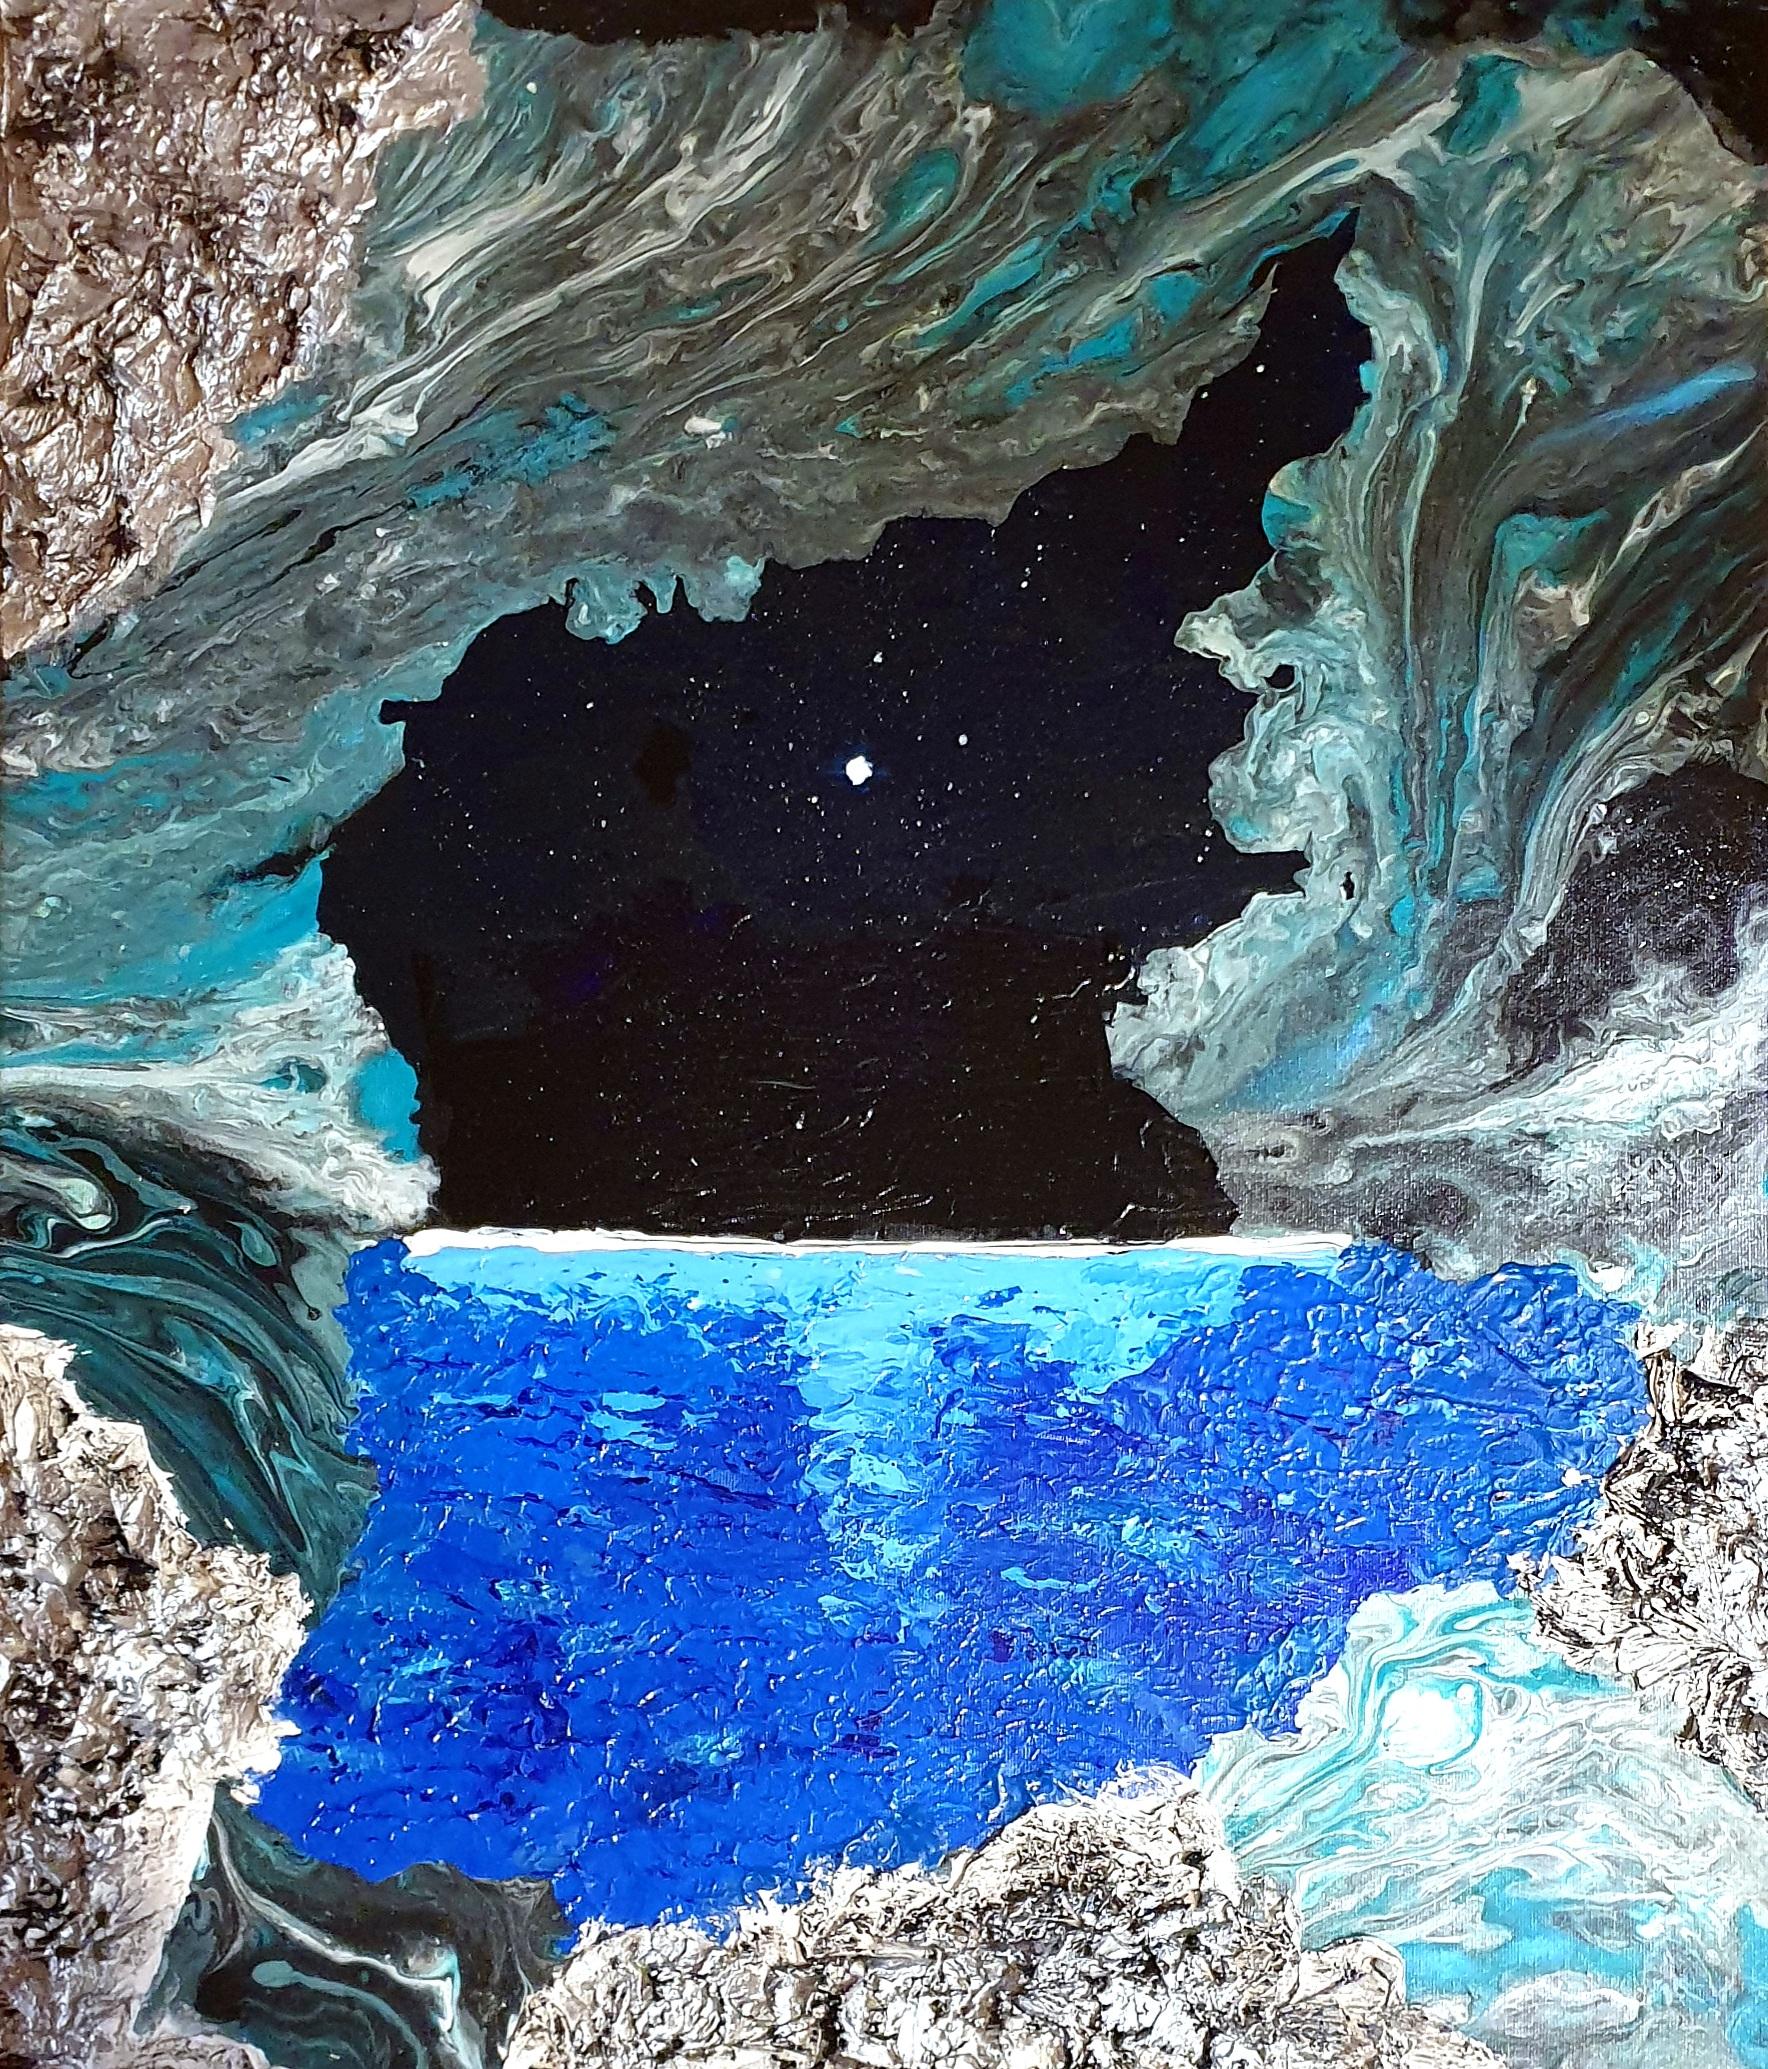 "Obraz akryl 60cm x 70cm pt. ""Jaskinia"" (2020)"